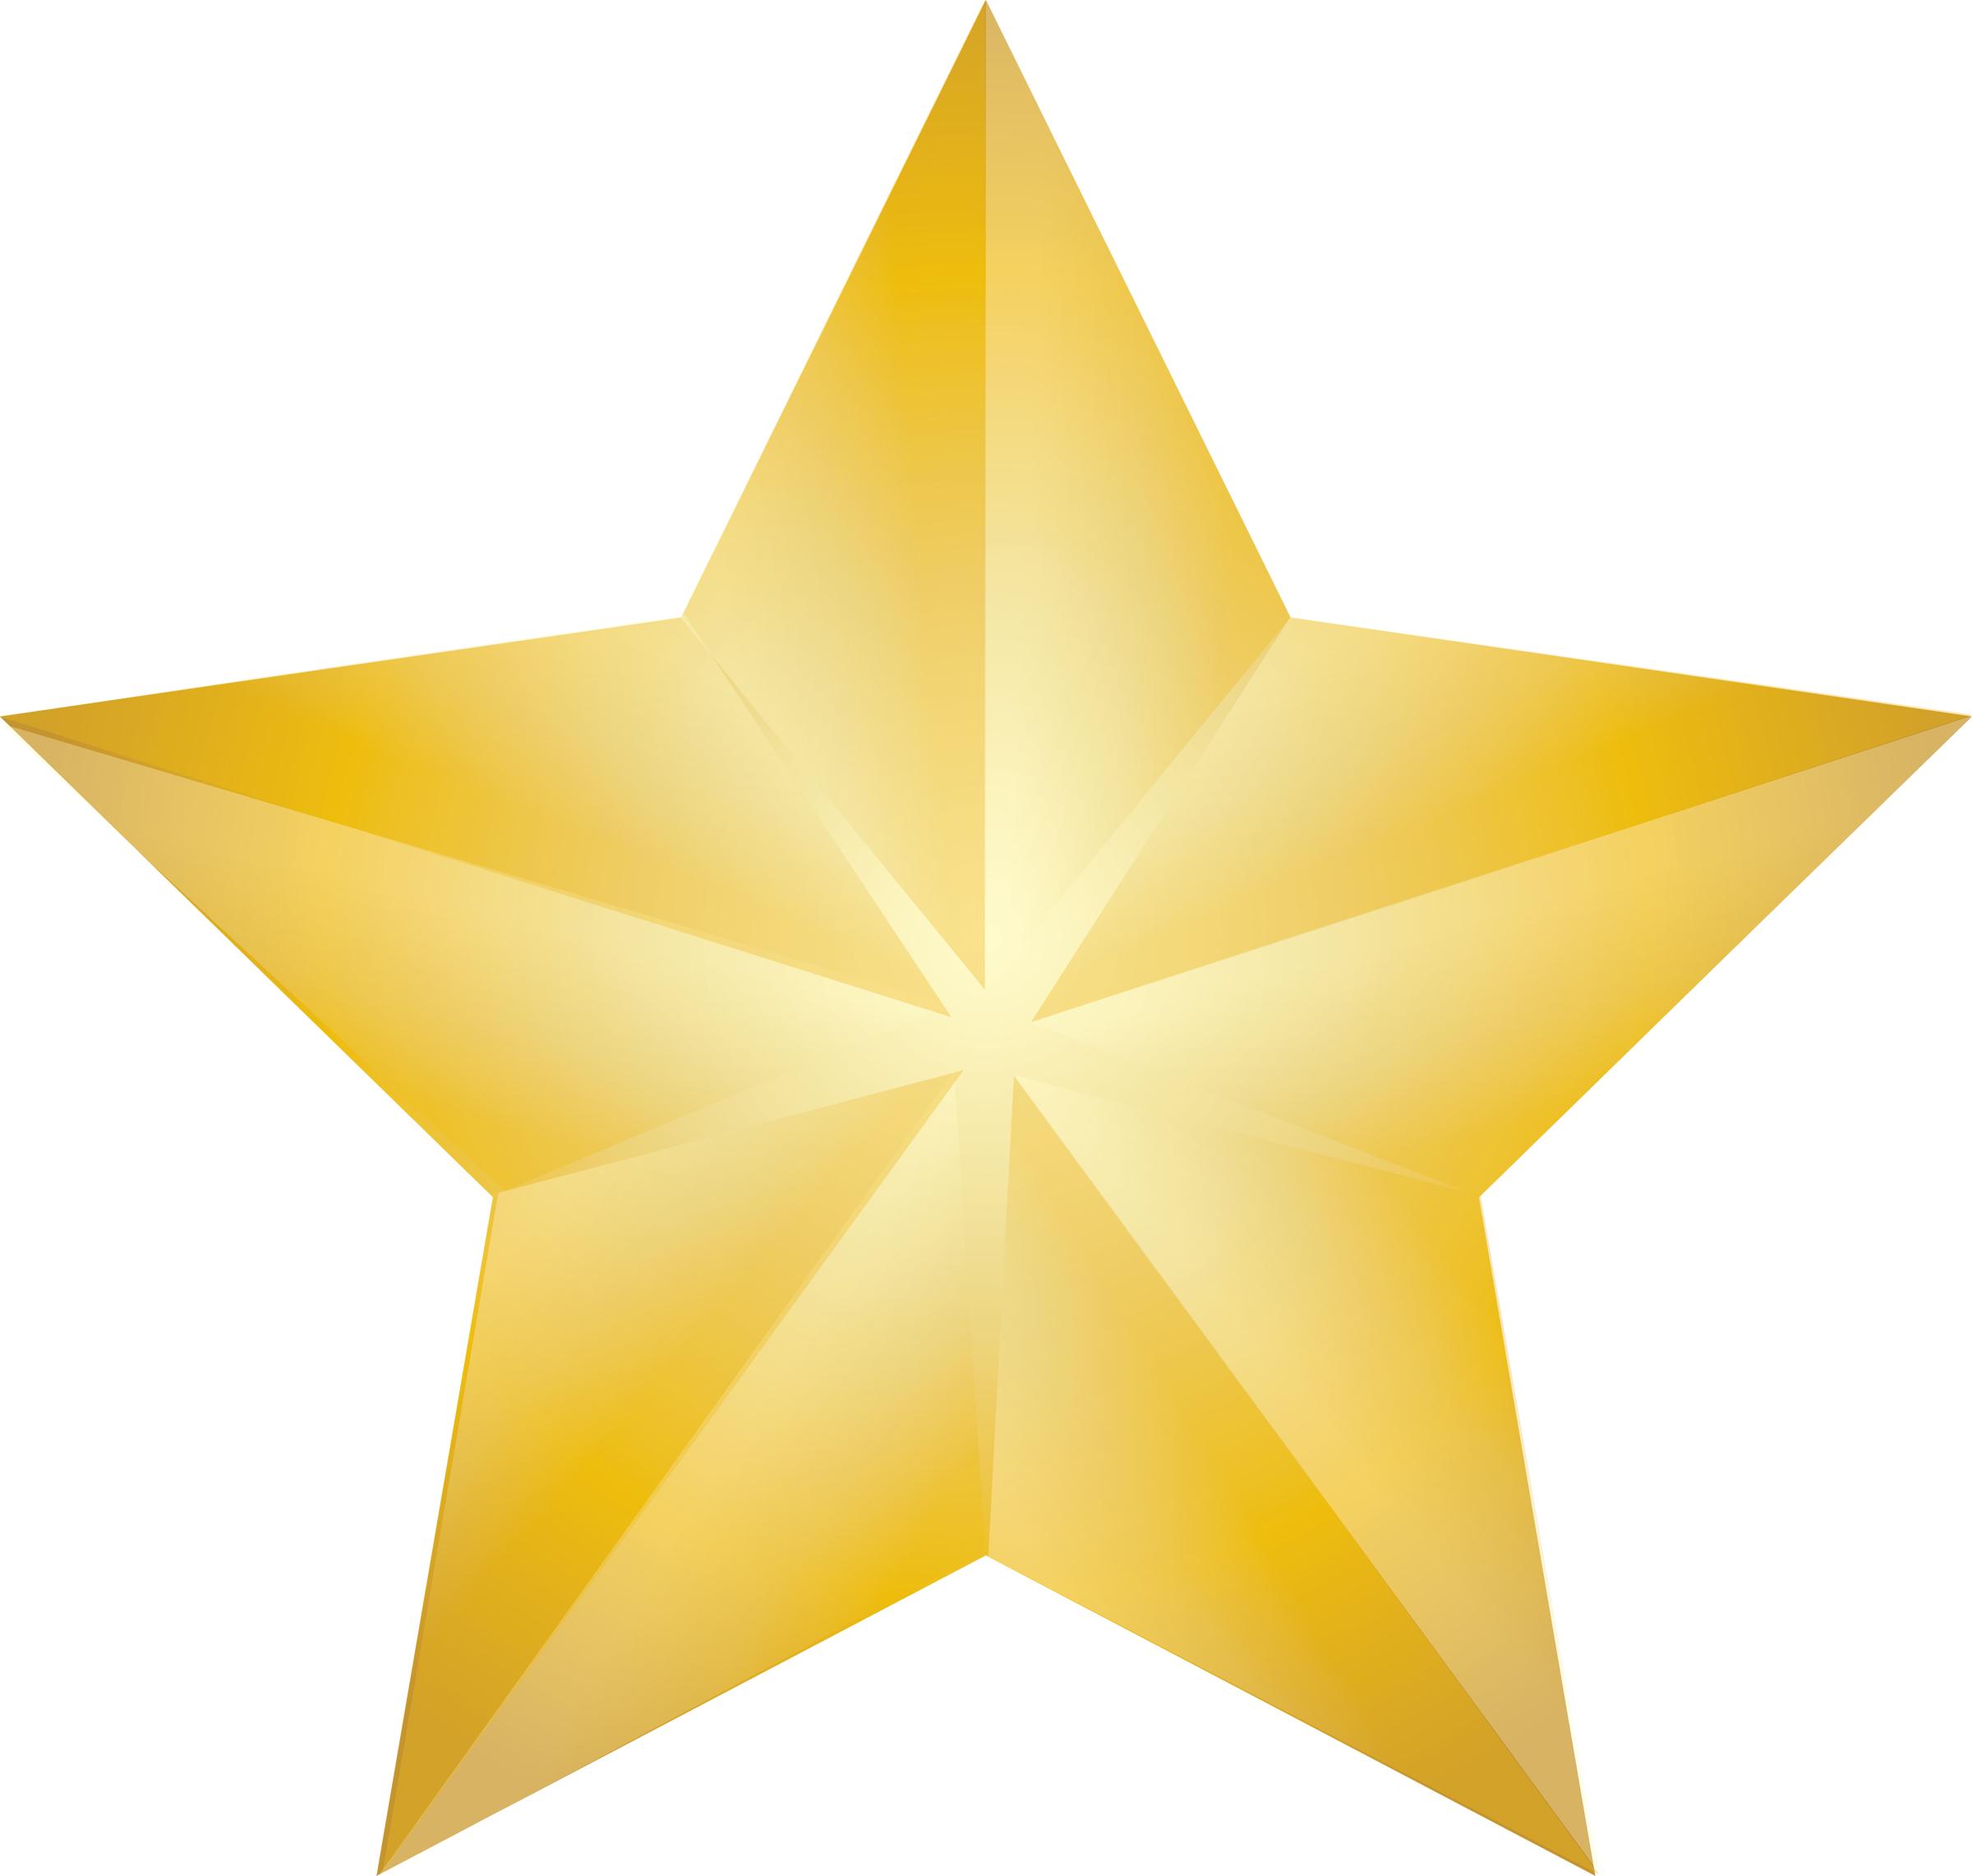 Clip Art Illustration Of A Shining Gold -Clip Art Illustration Of A Shining Gold Christmas Star St Paul S-2